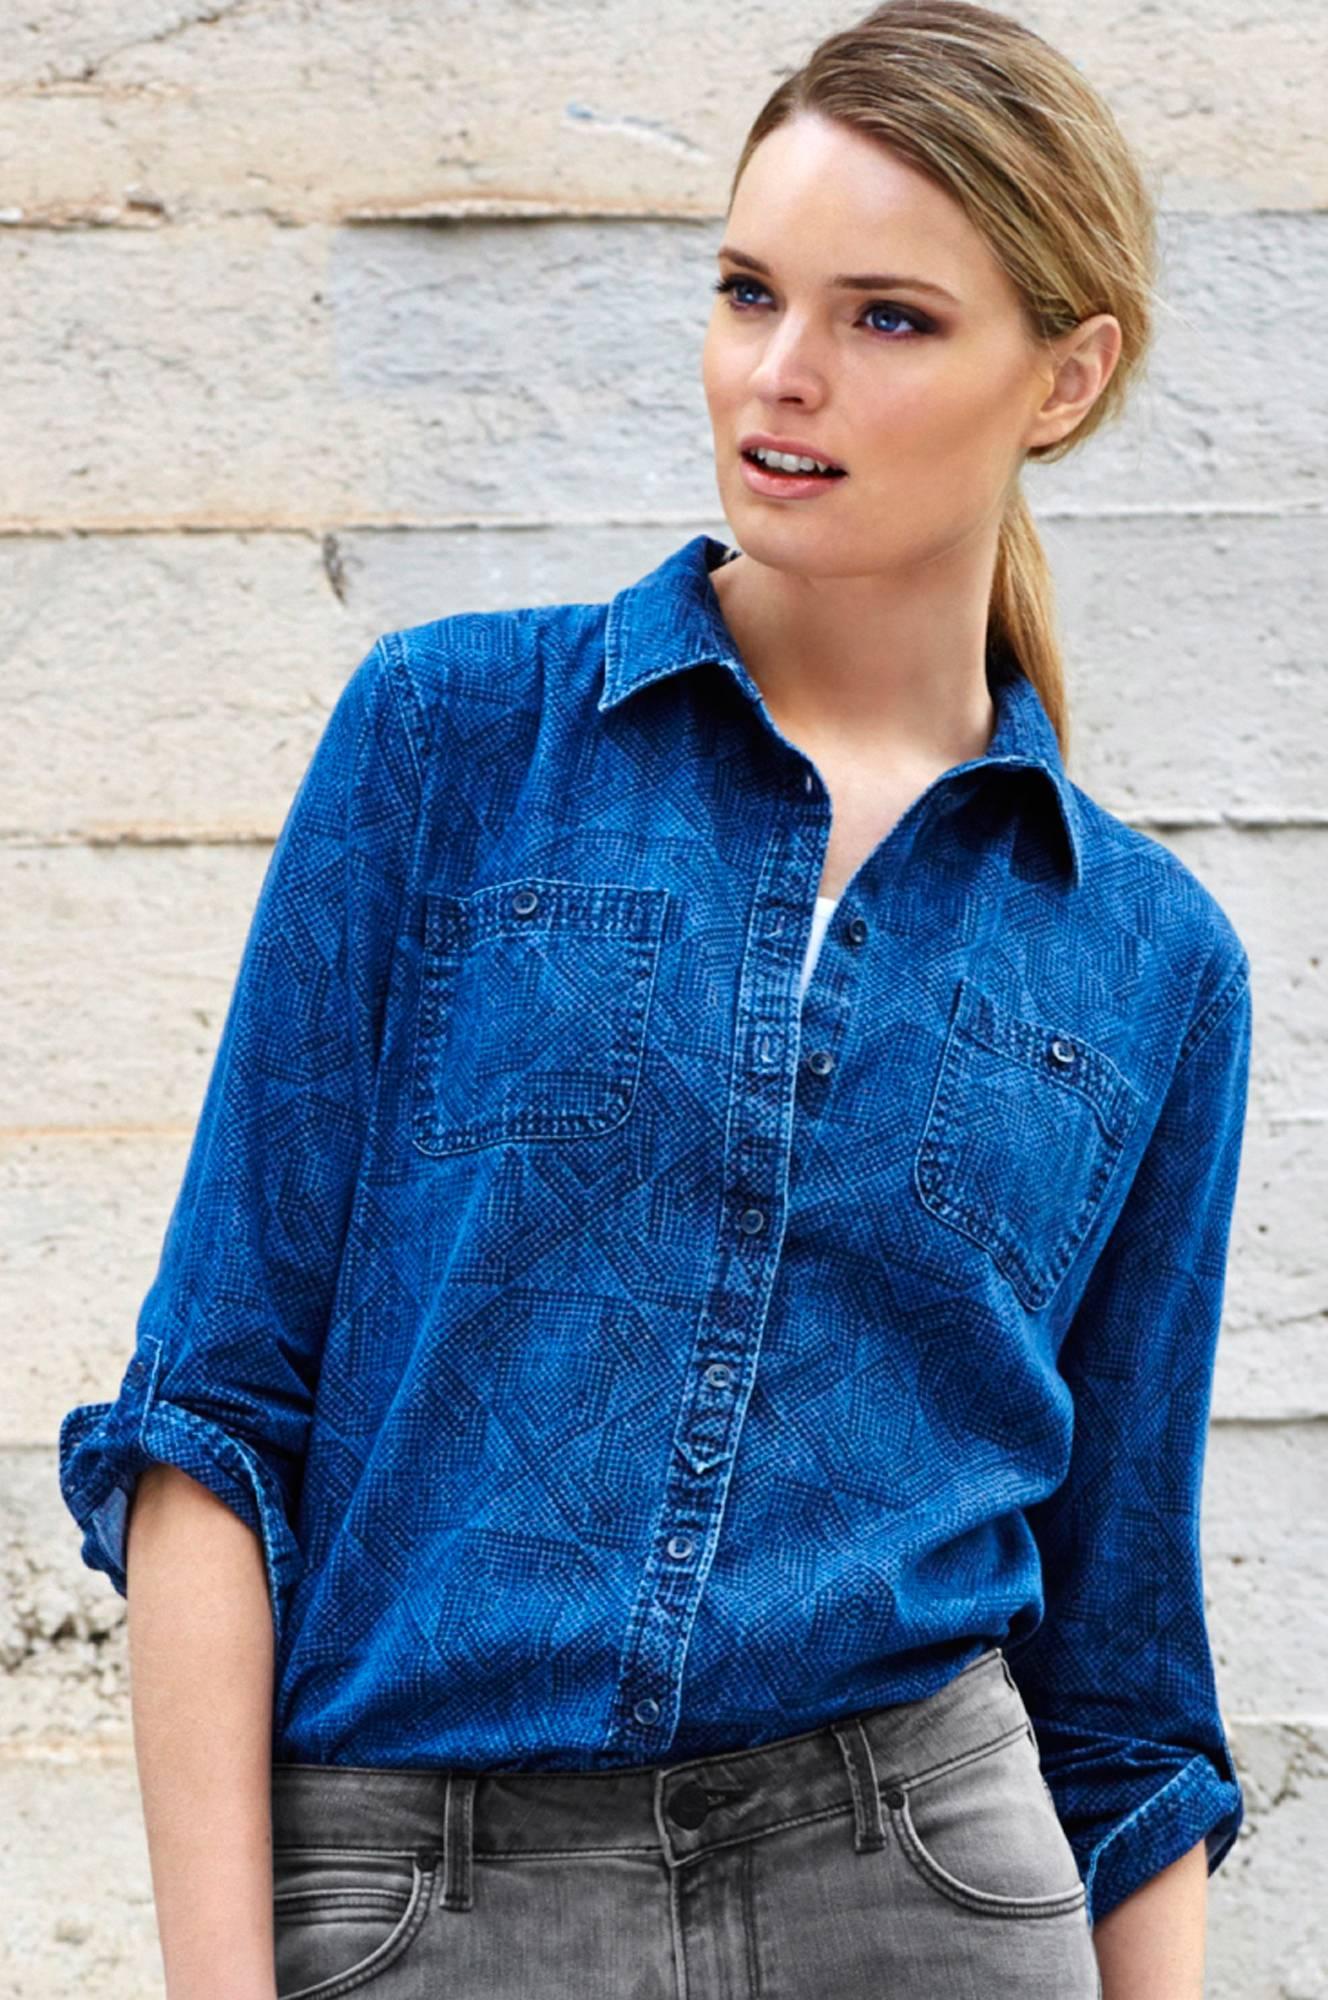 Denimskjorte Lee Skjorter & bluser til Kvinder i Blue Ice/ blåmønstret